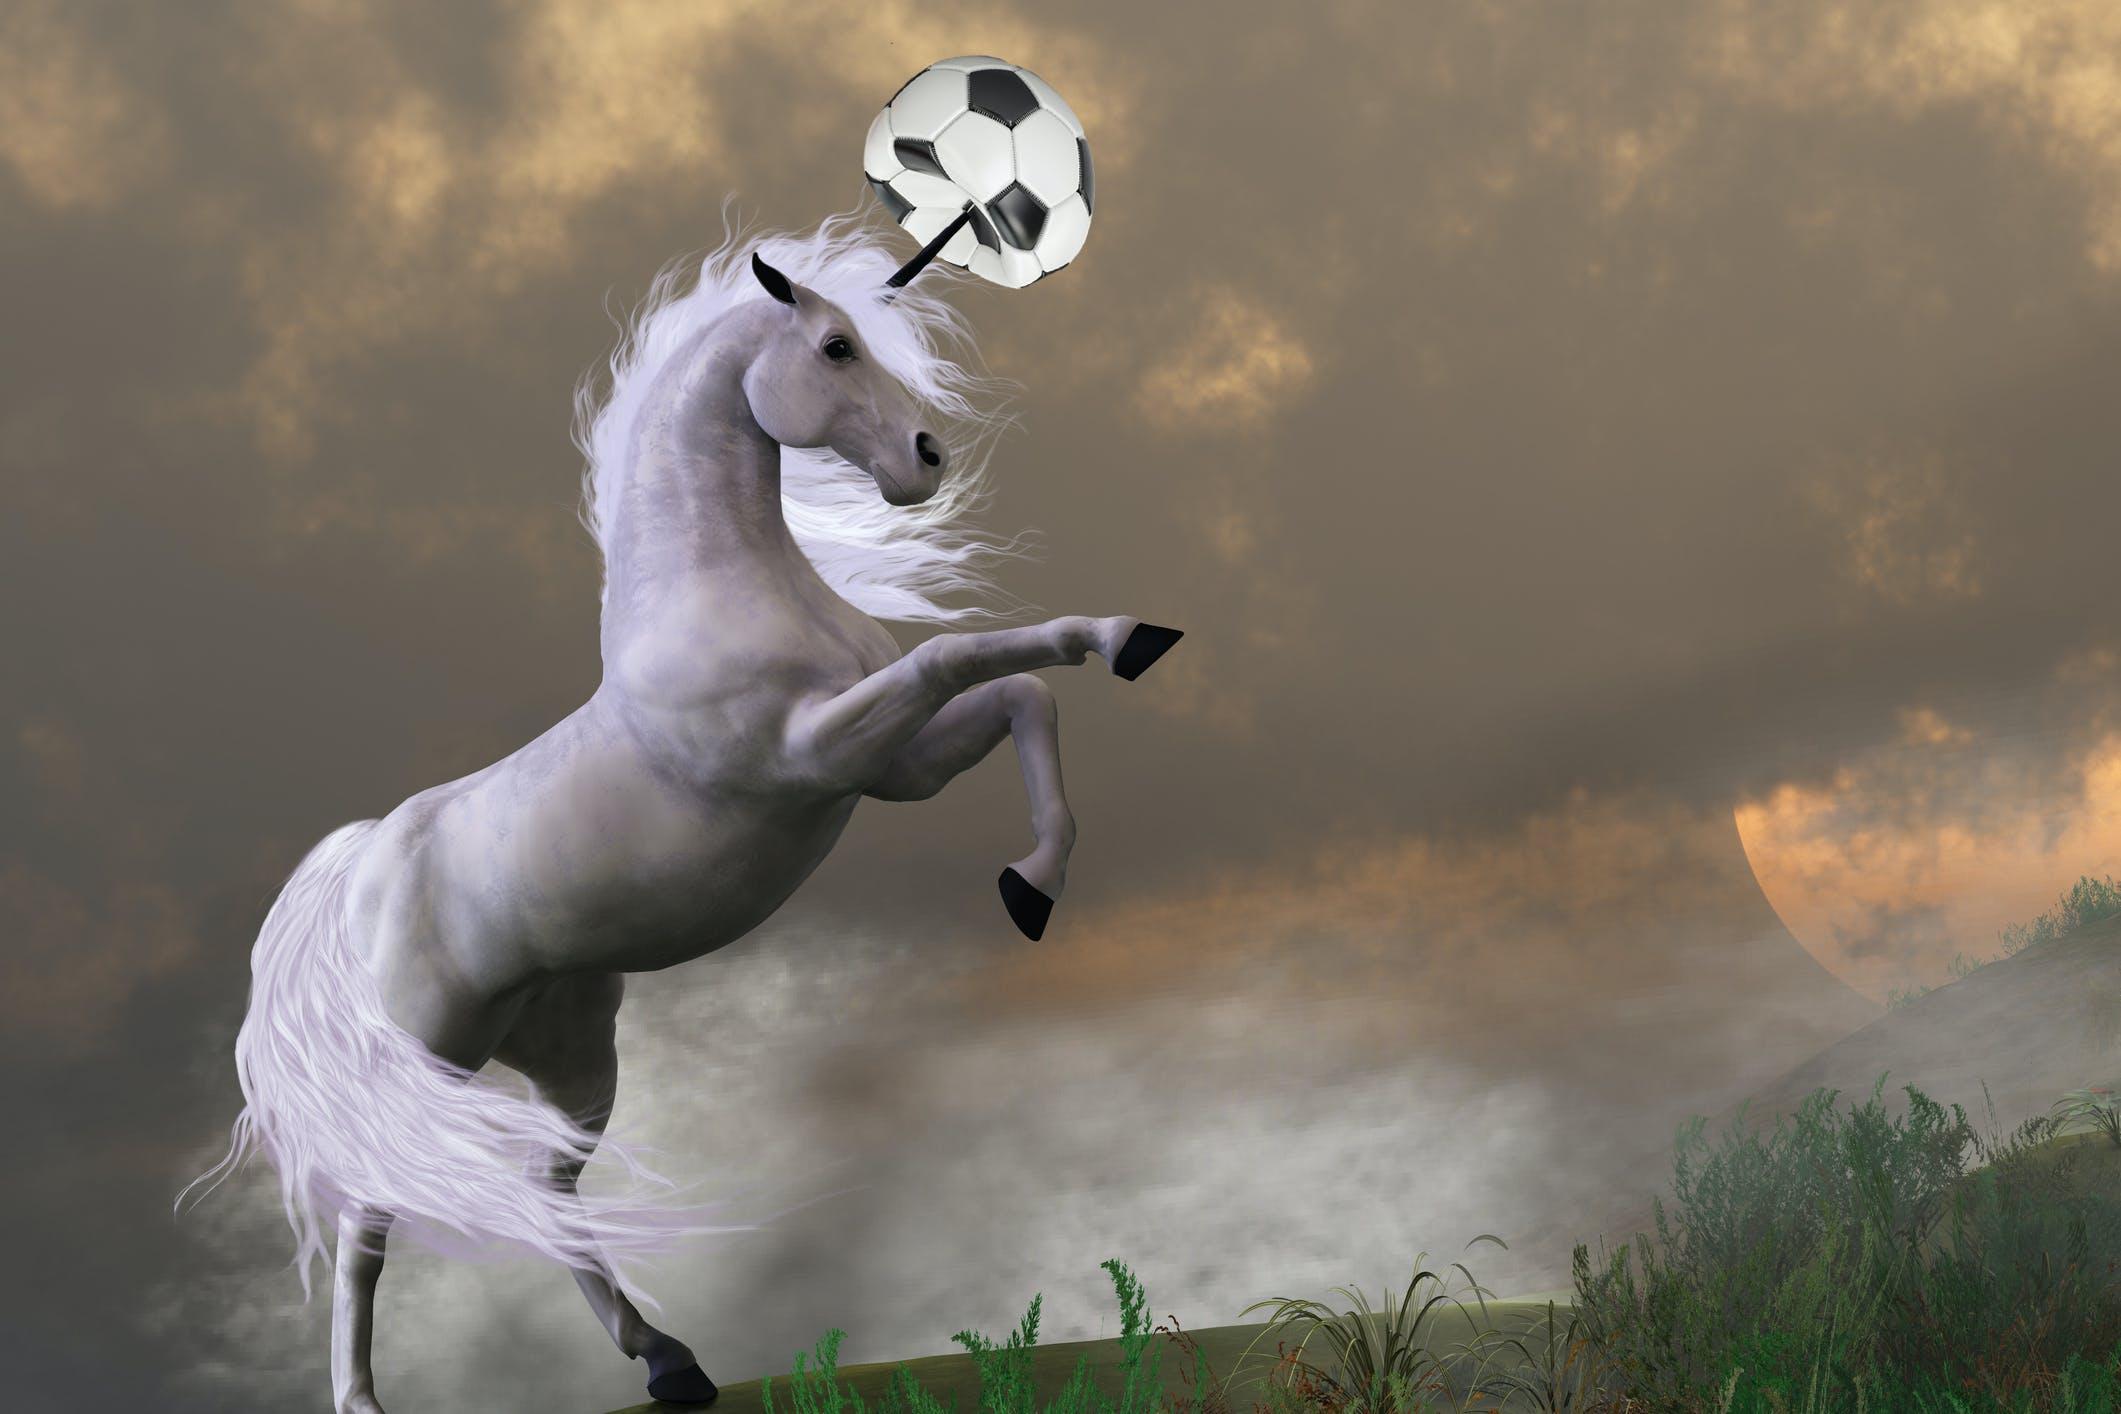 A unicorn bursting a perfectly good football